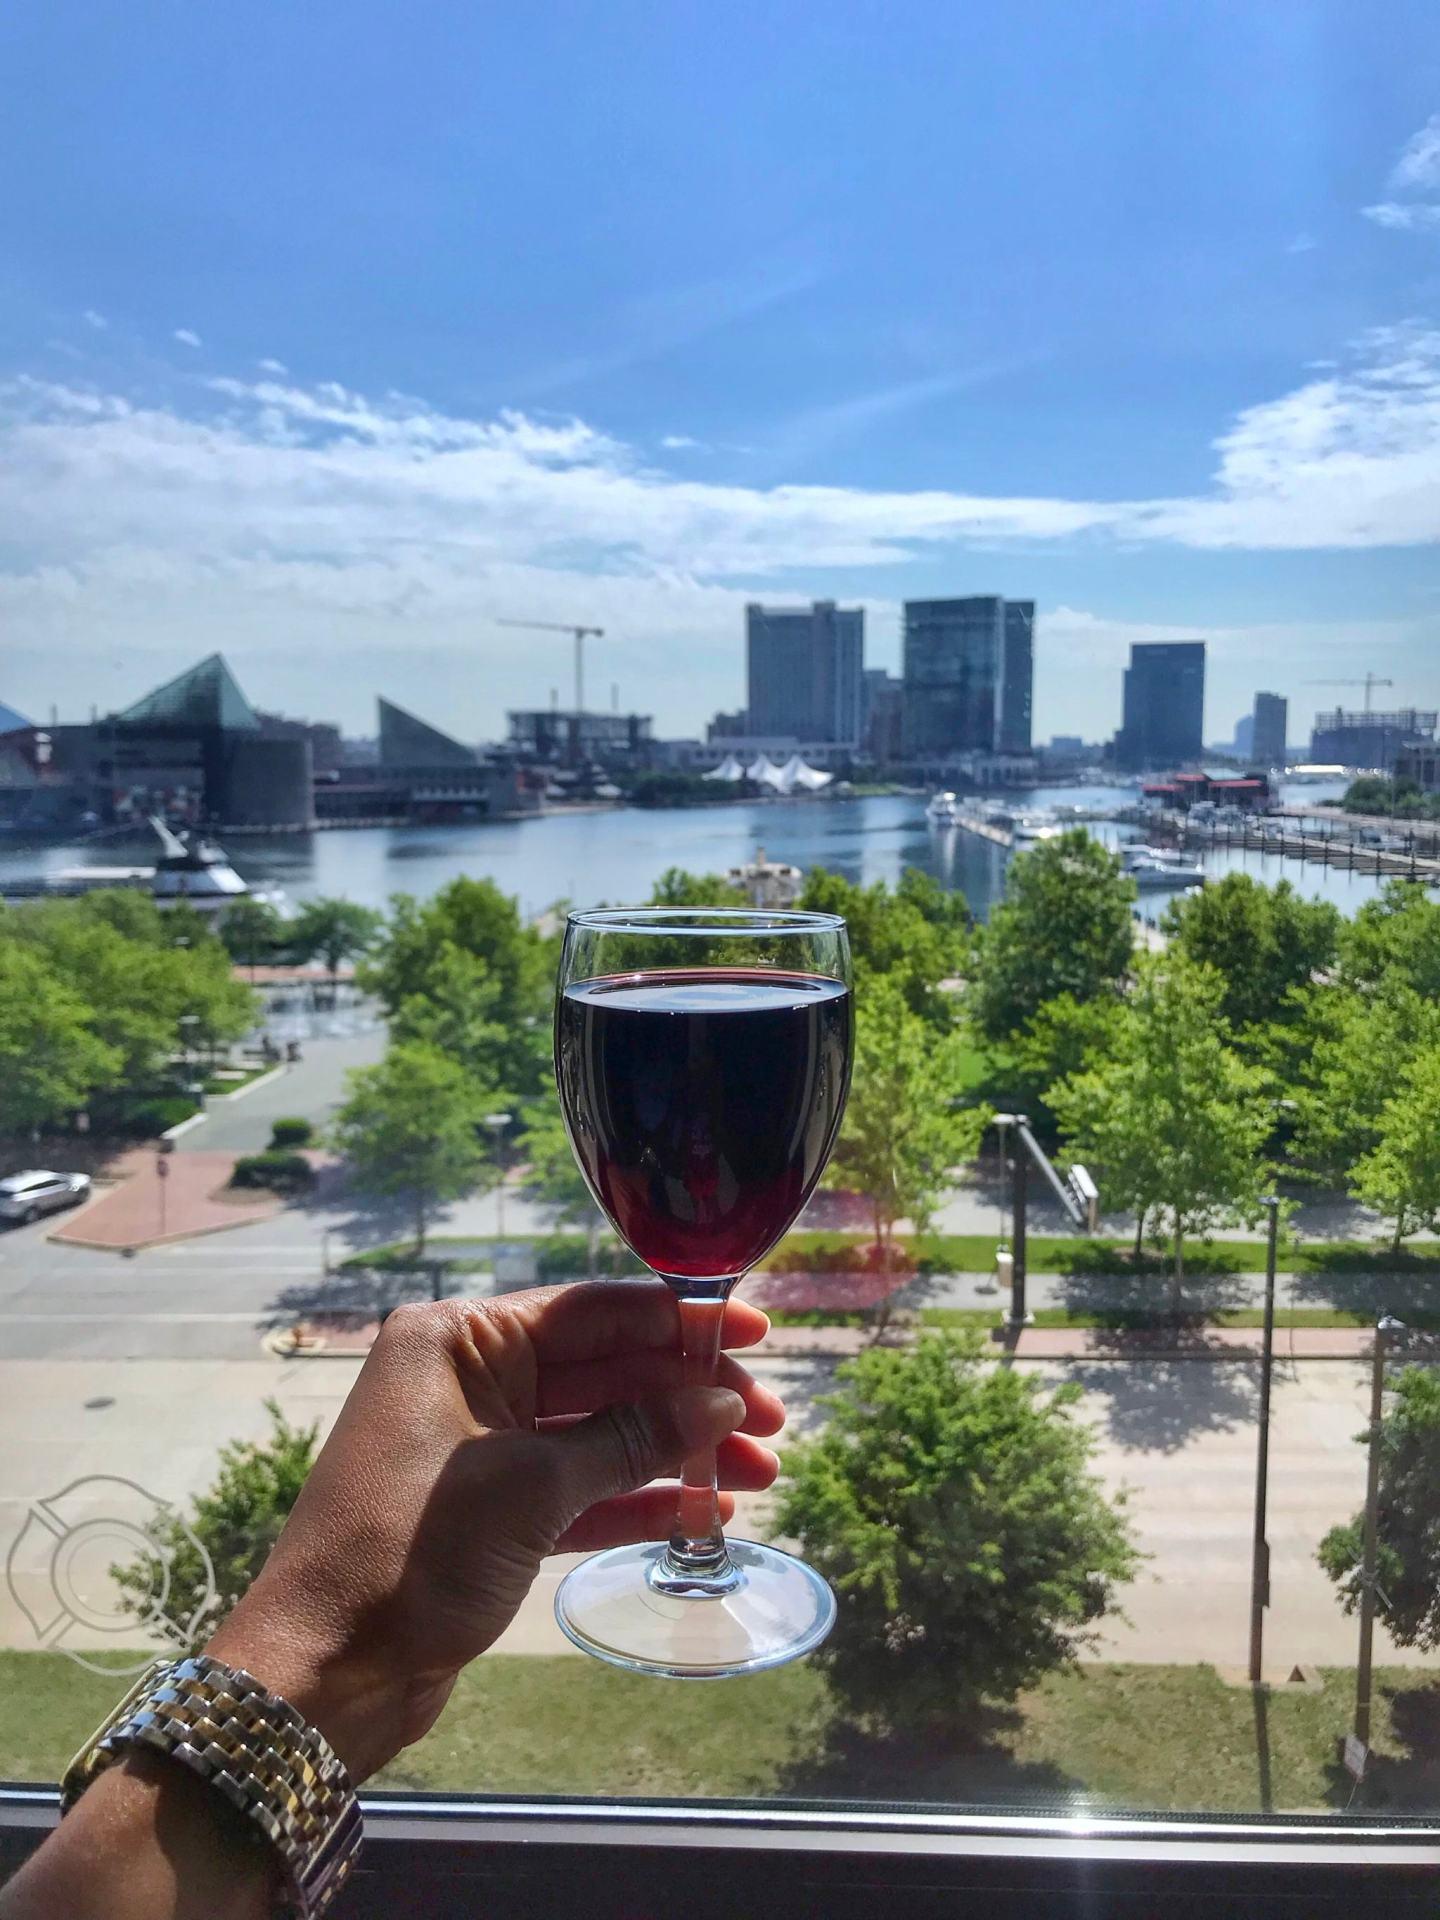 Sonesta Royal Harbor Court Baltimore Review